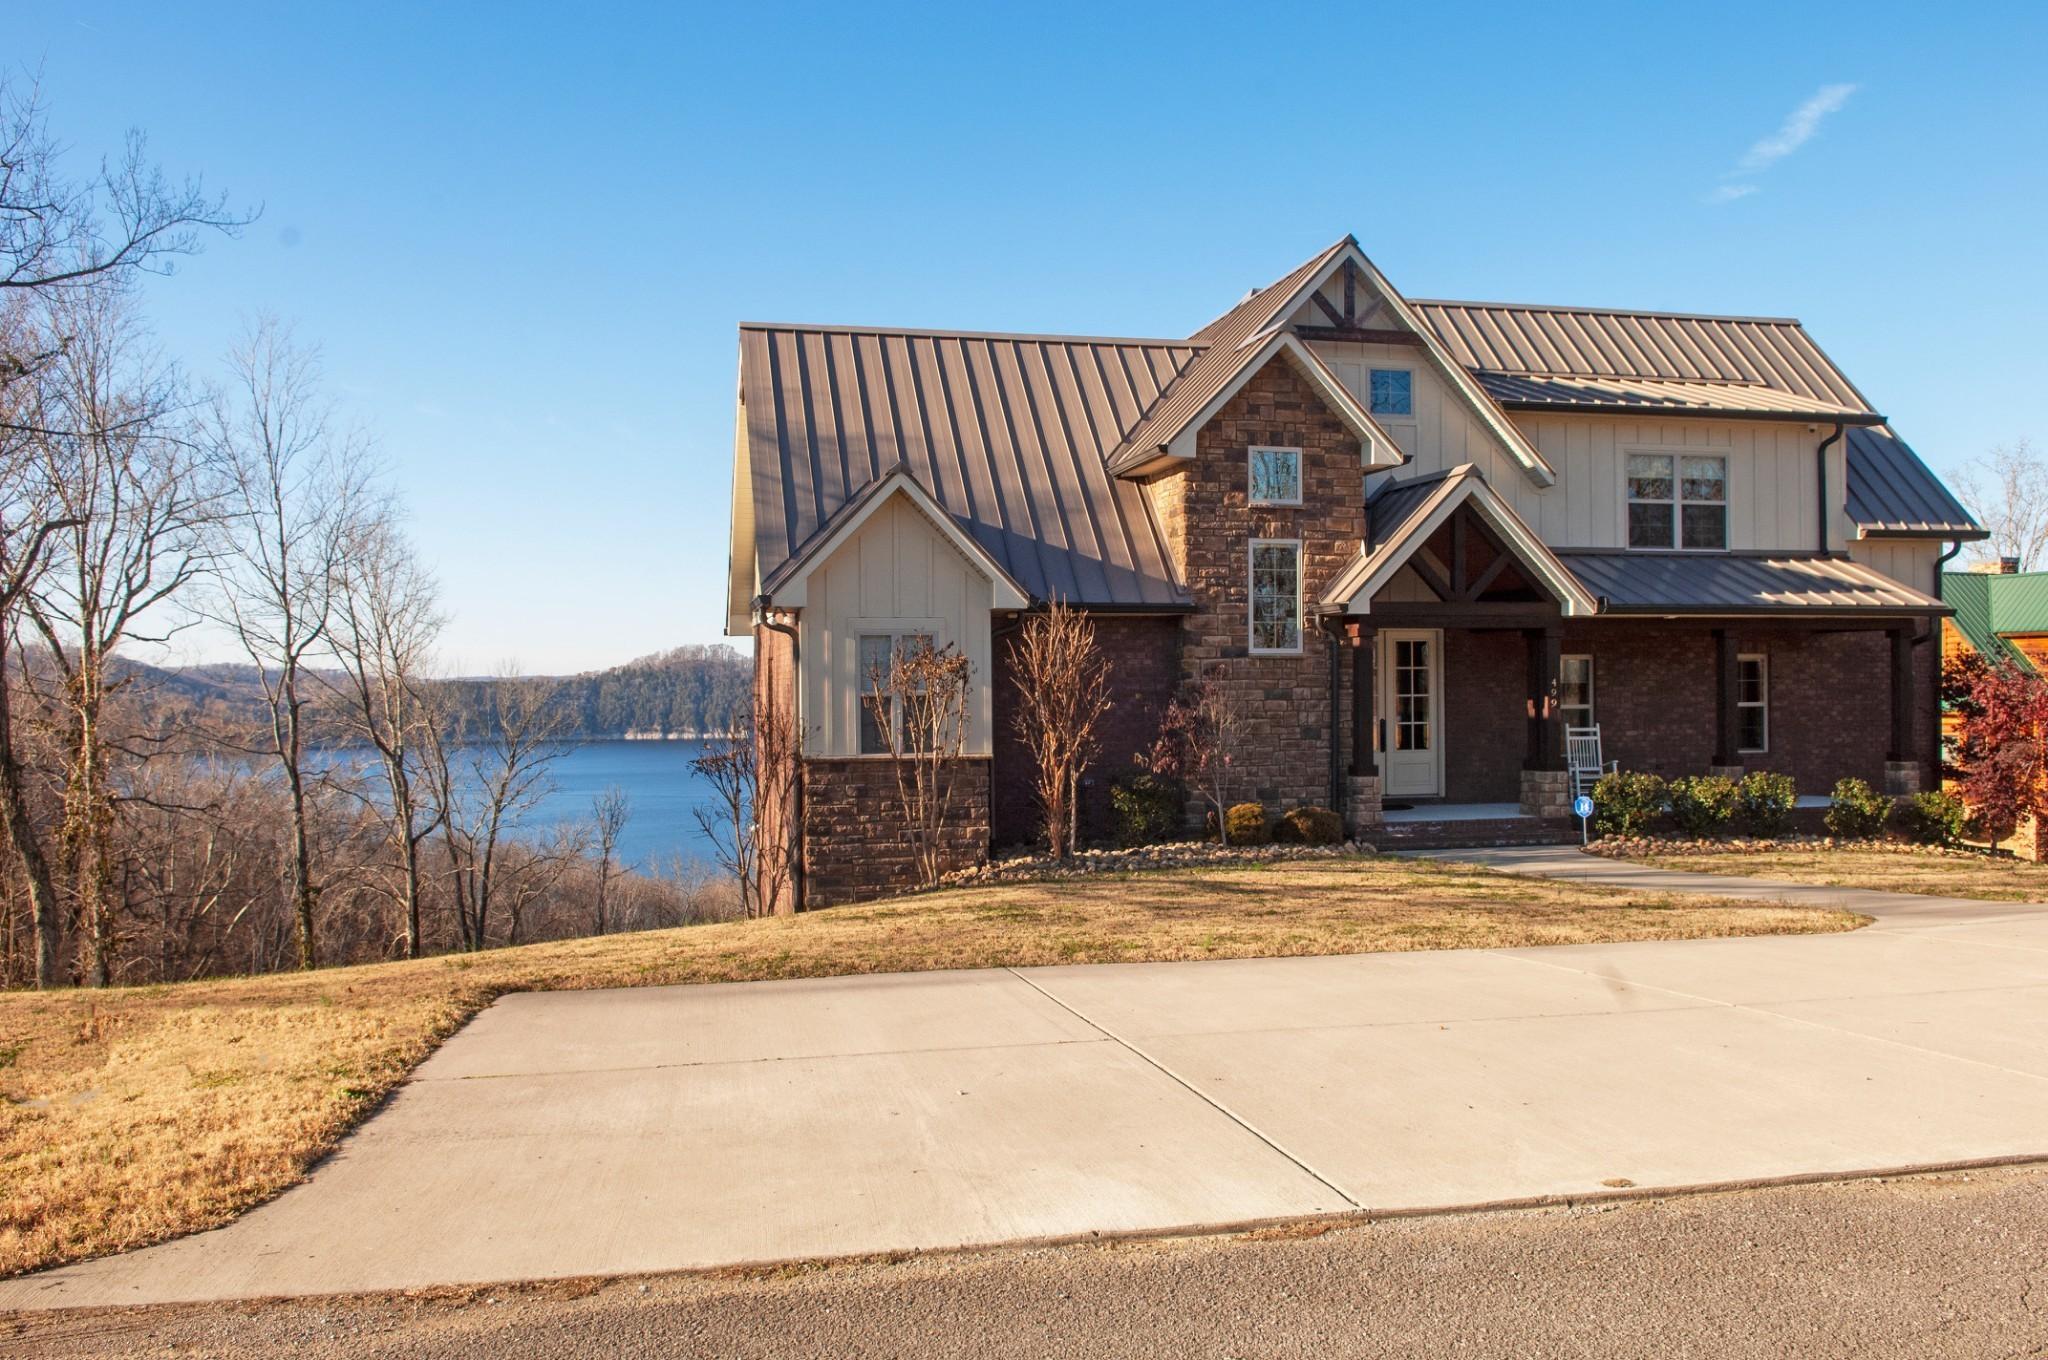 499 Maury Ln Property Photo - Smithville, TN real estate listing